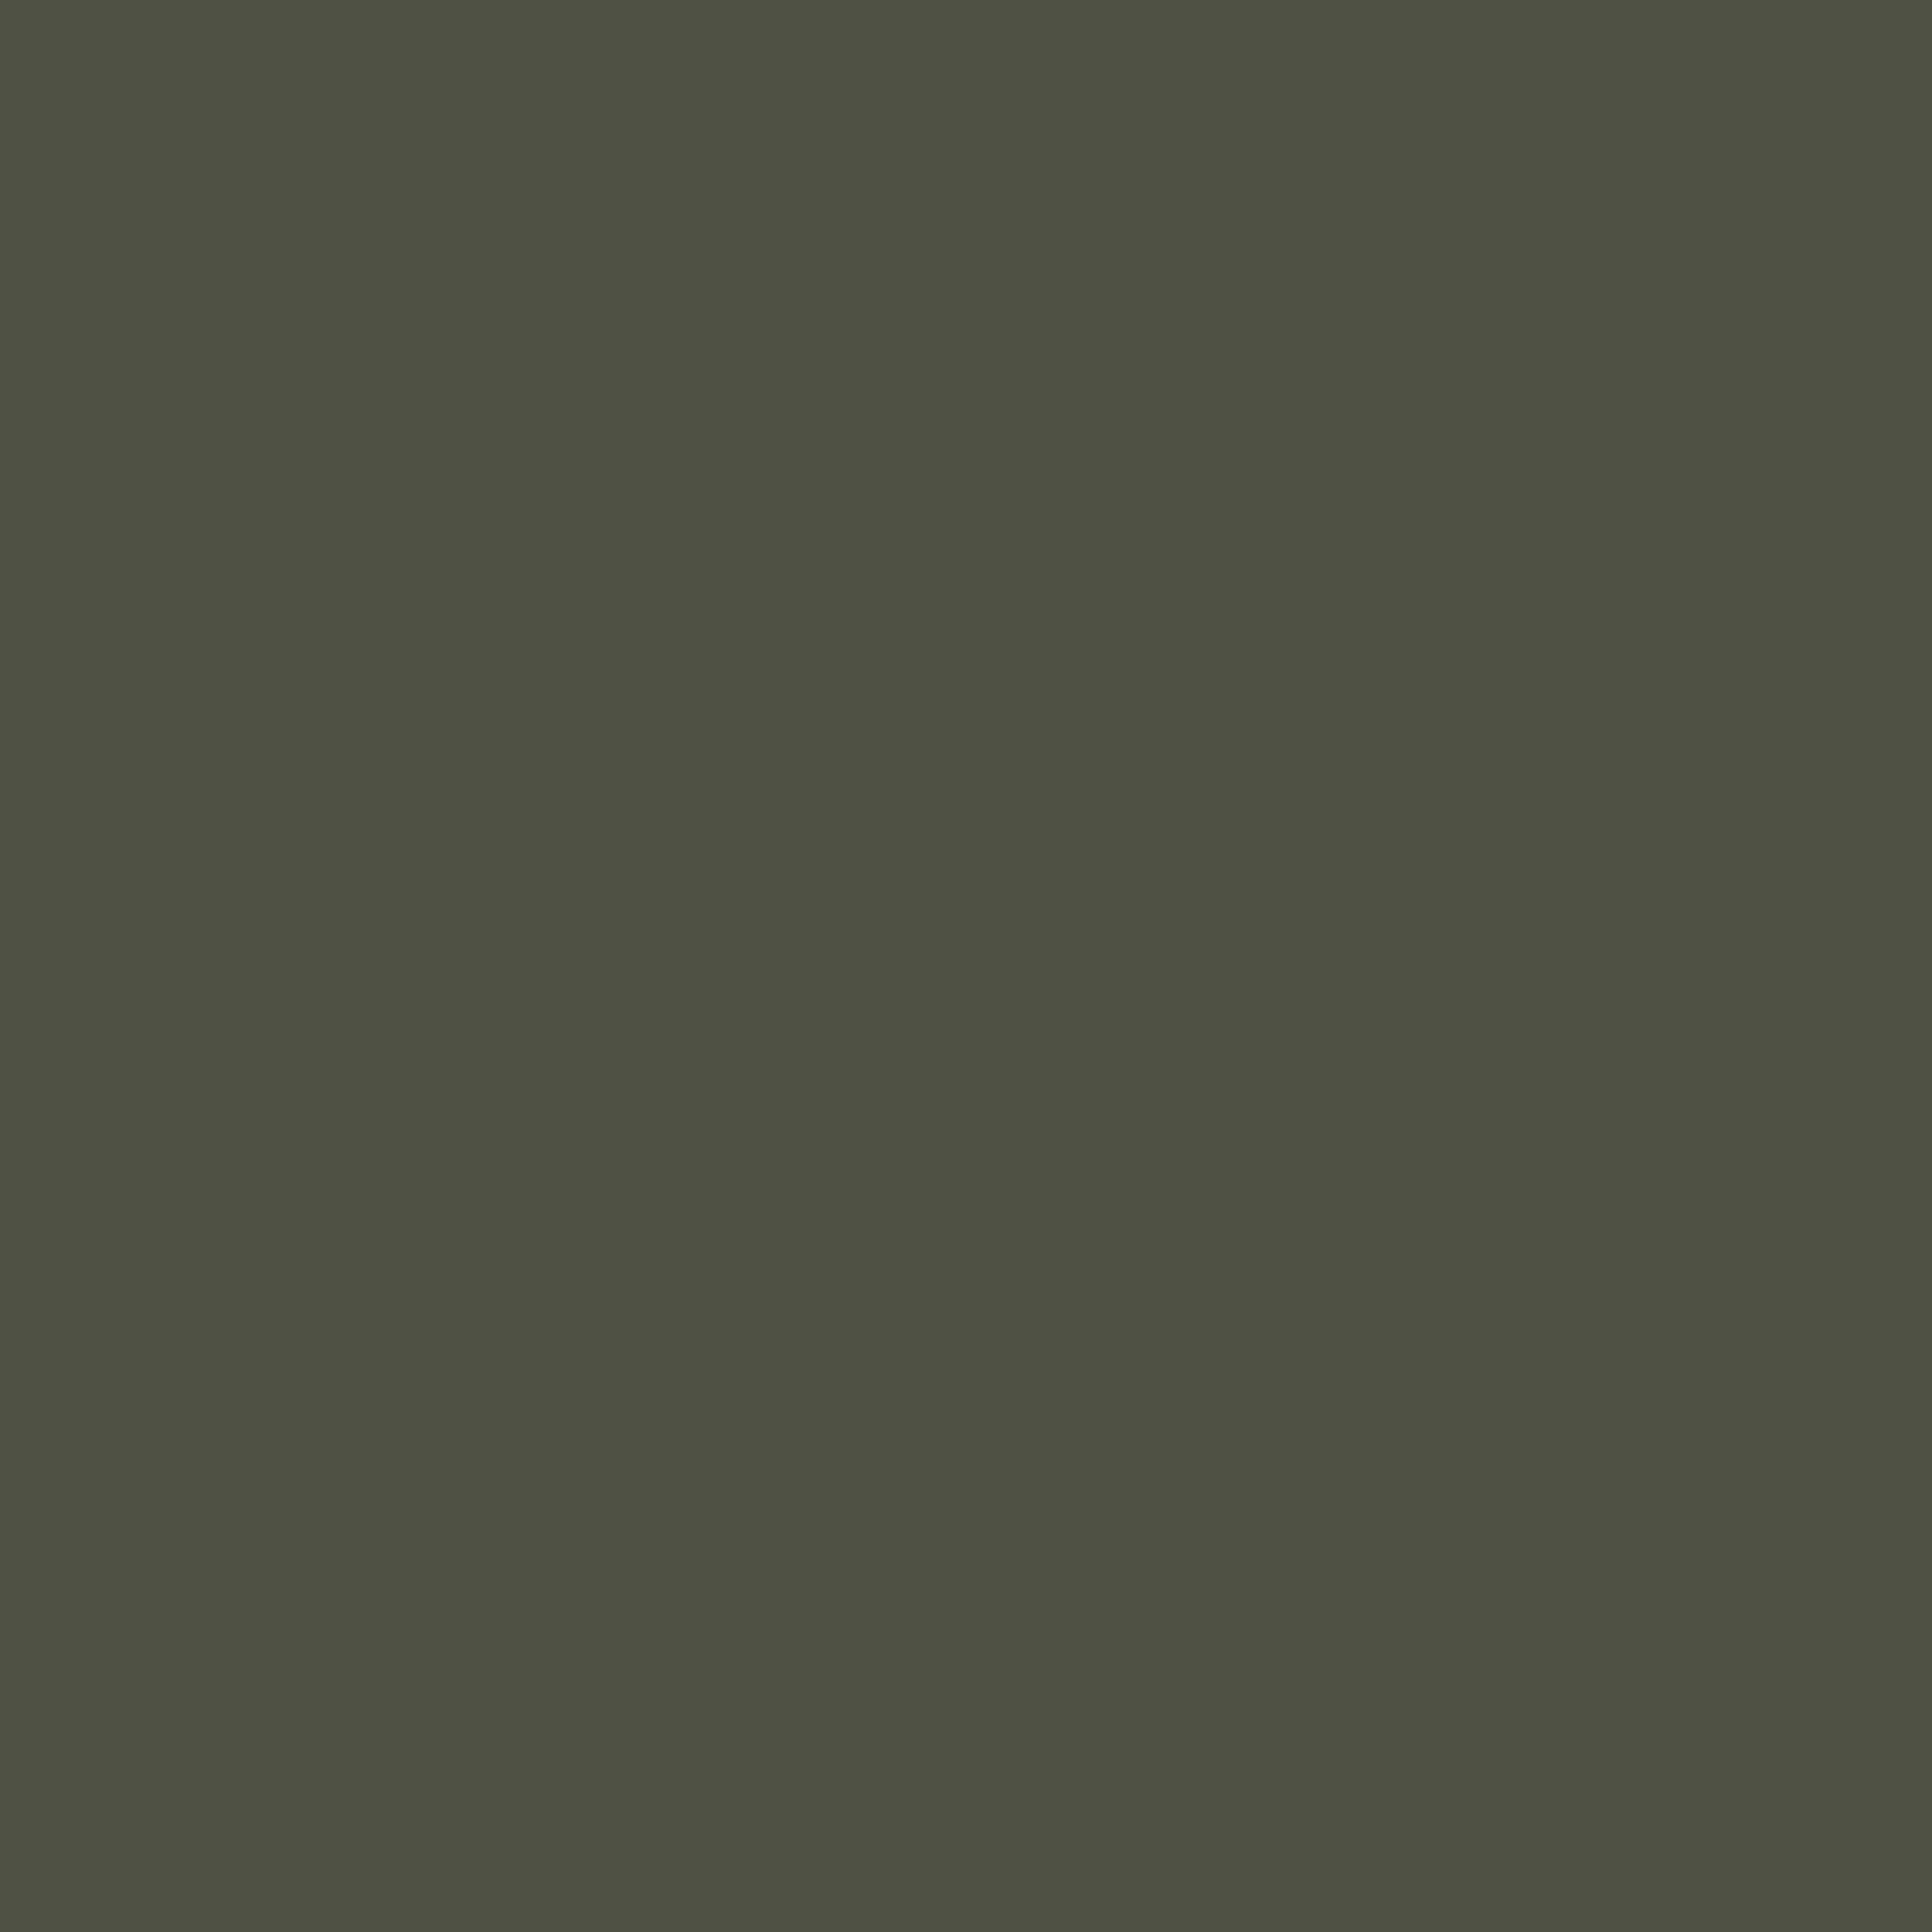 H.olive-mossgreen